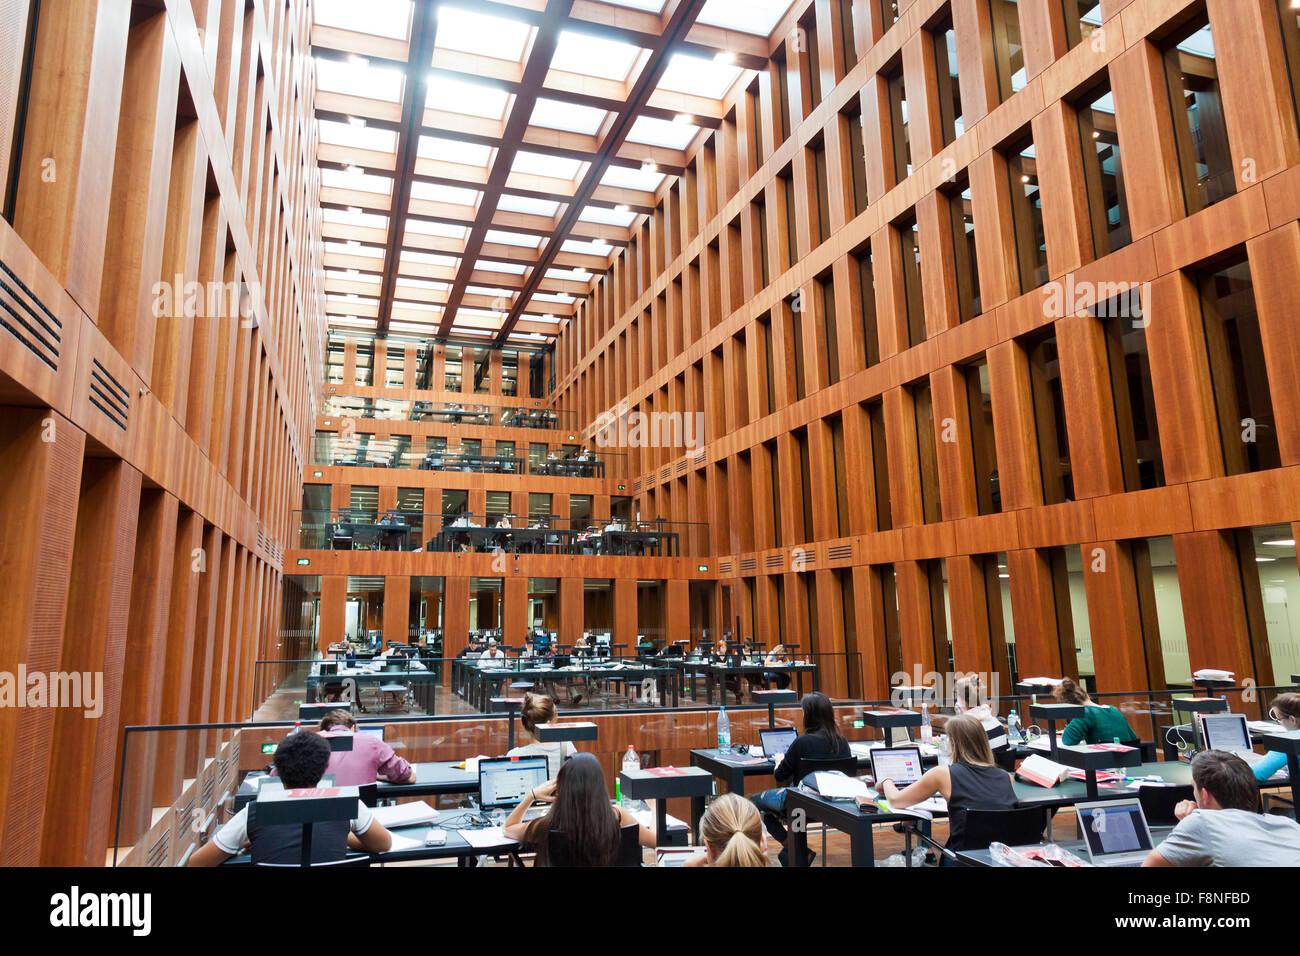 Humboldt University Bibliothek